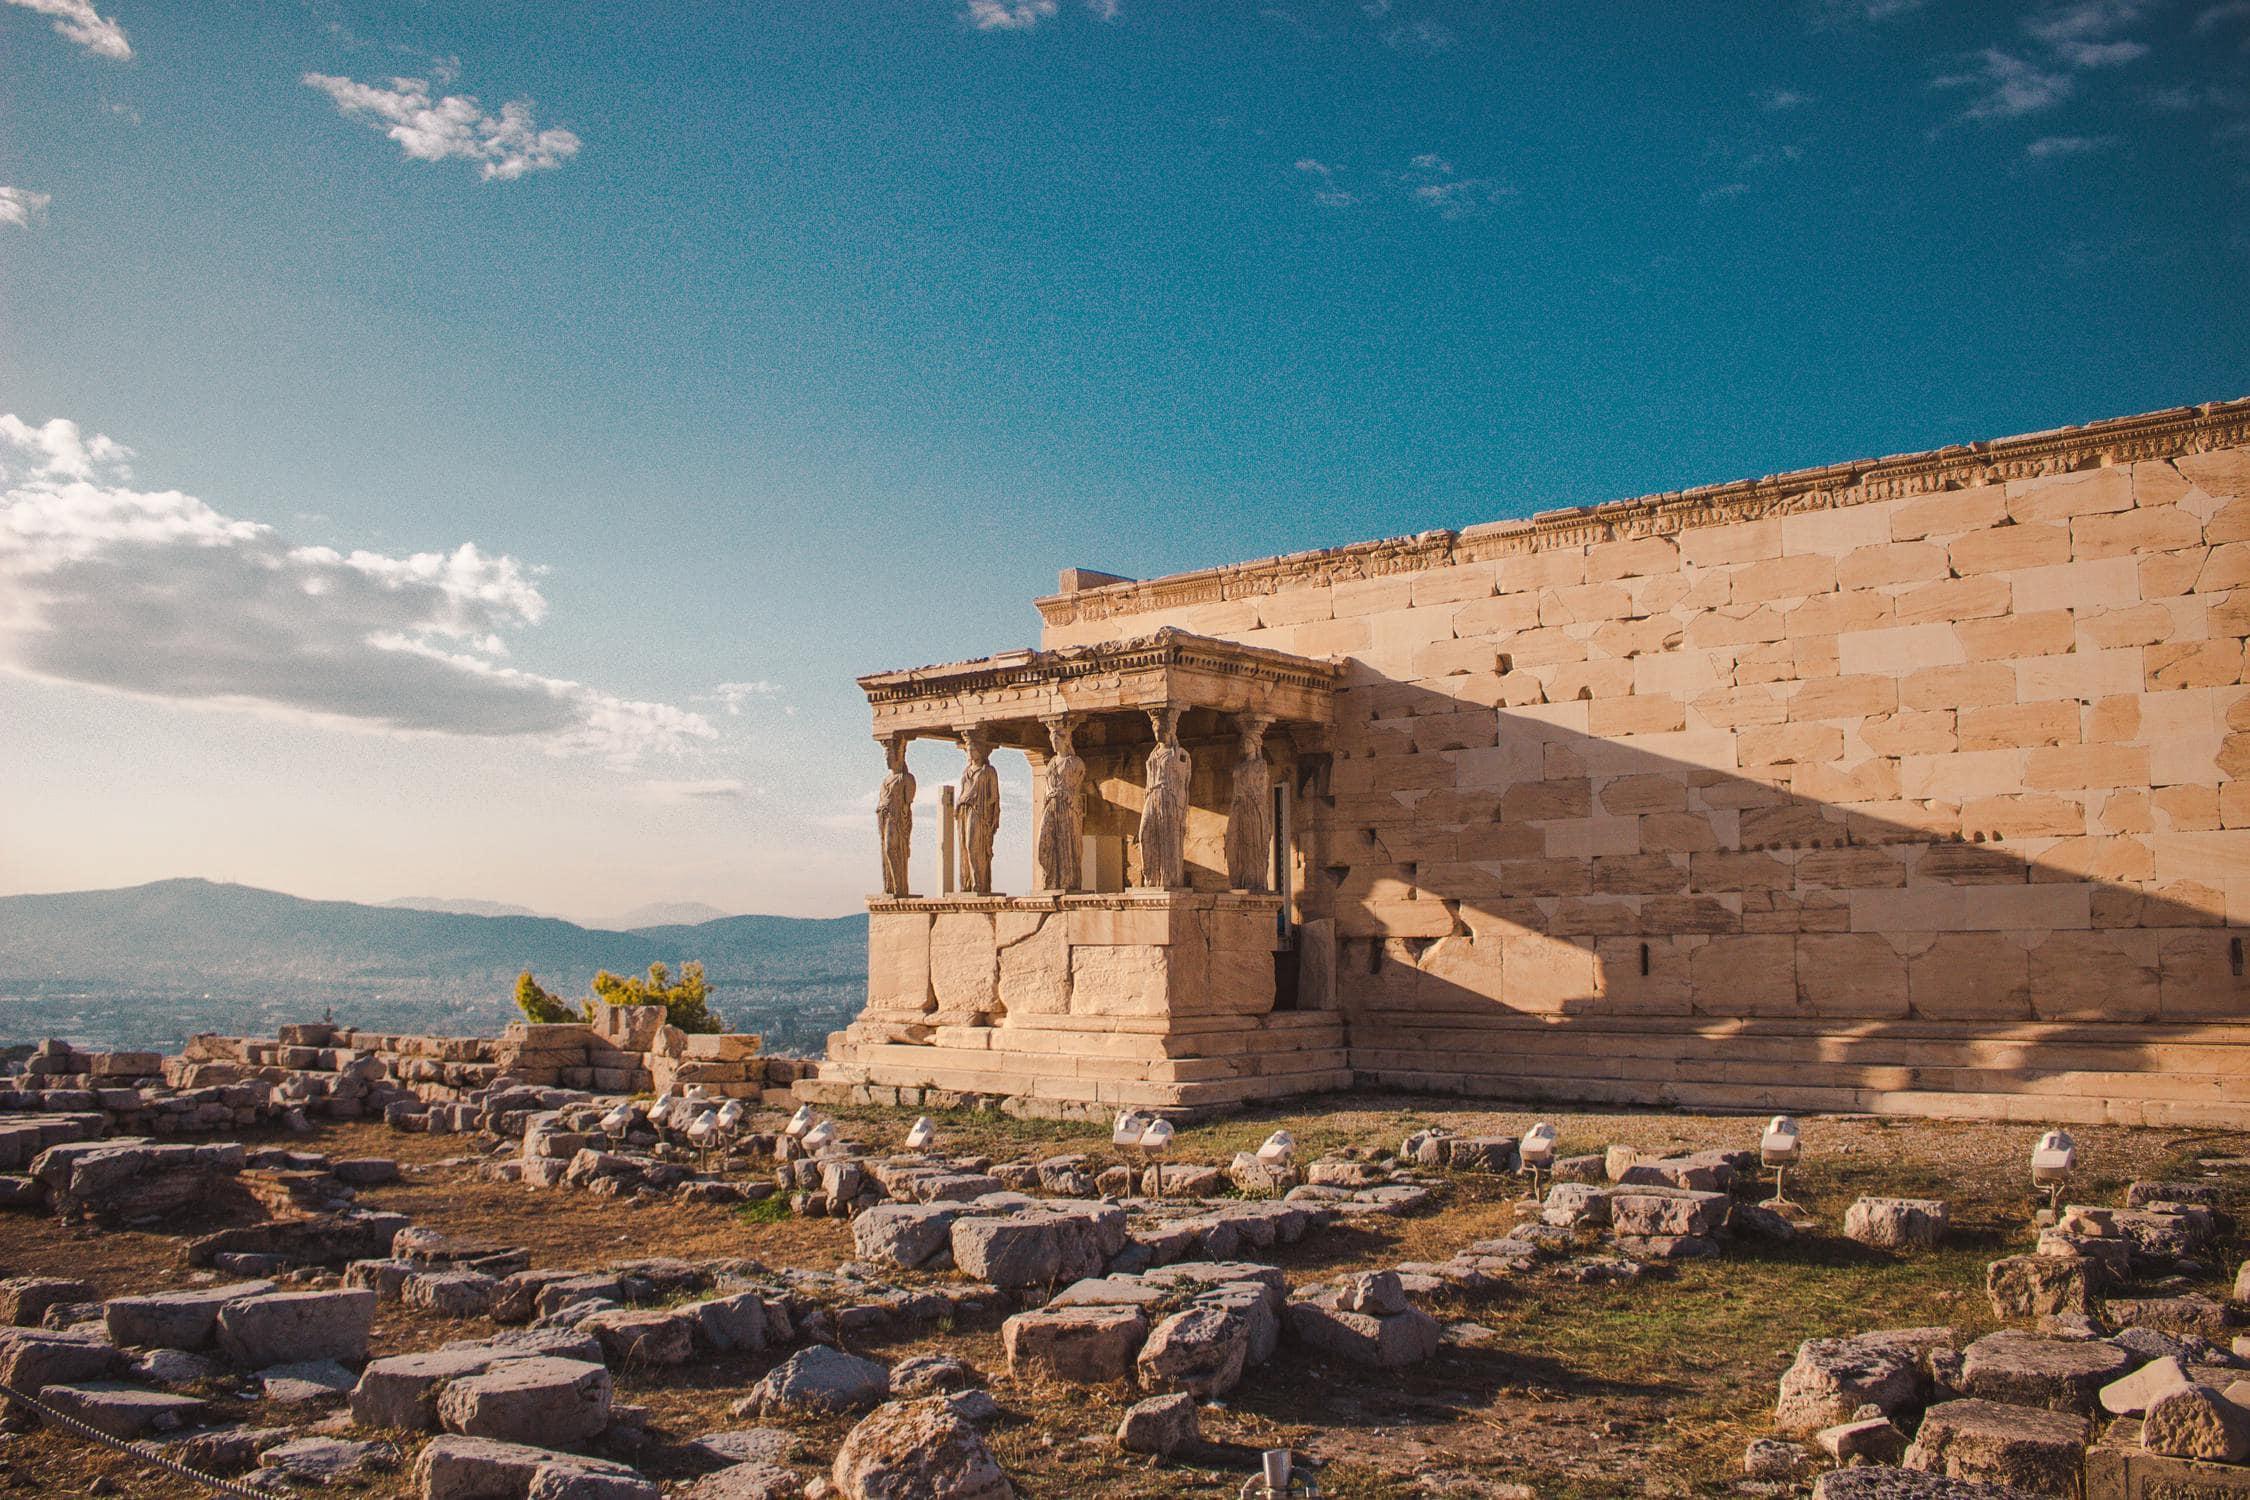 Antikes Gebäude früherer Zivilisationen